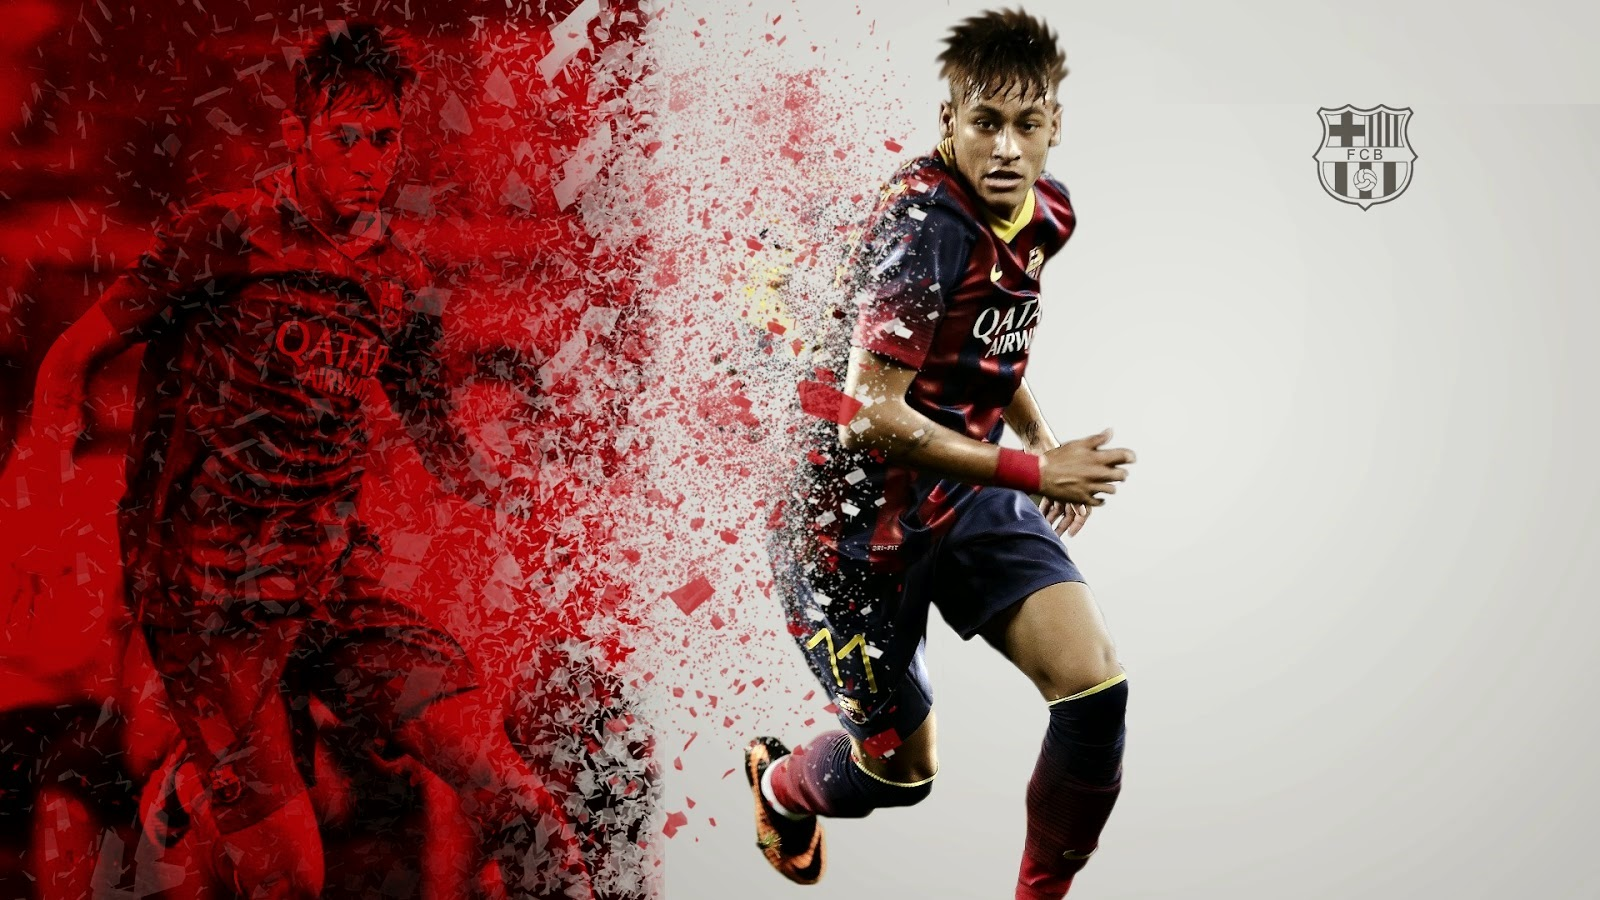 Football World Neymar Jr Fc Barcelona Latest Hd Wallpapers 2014